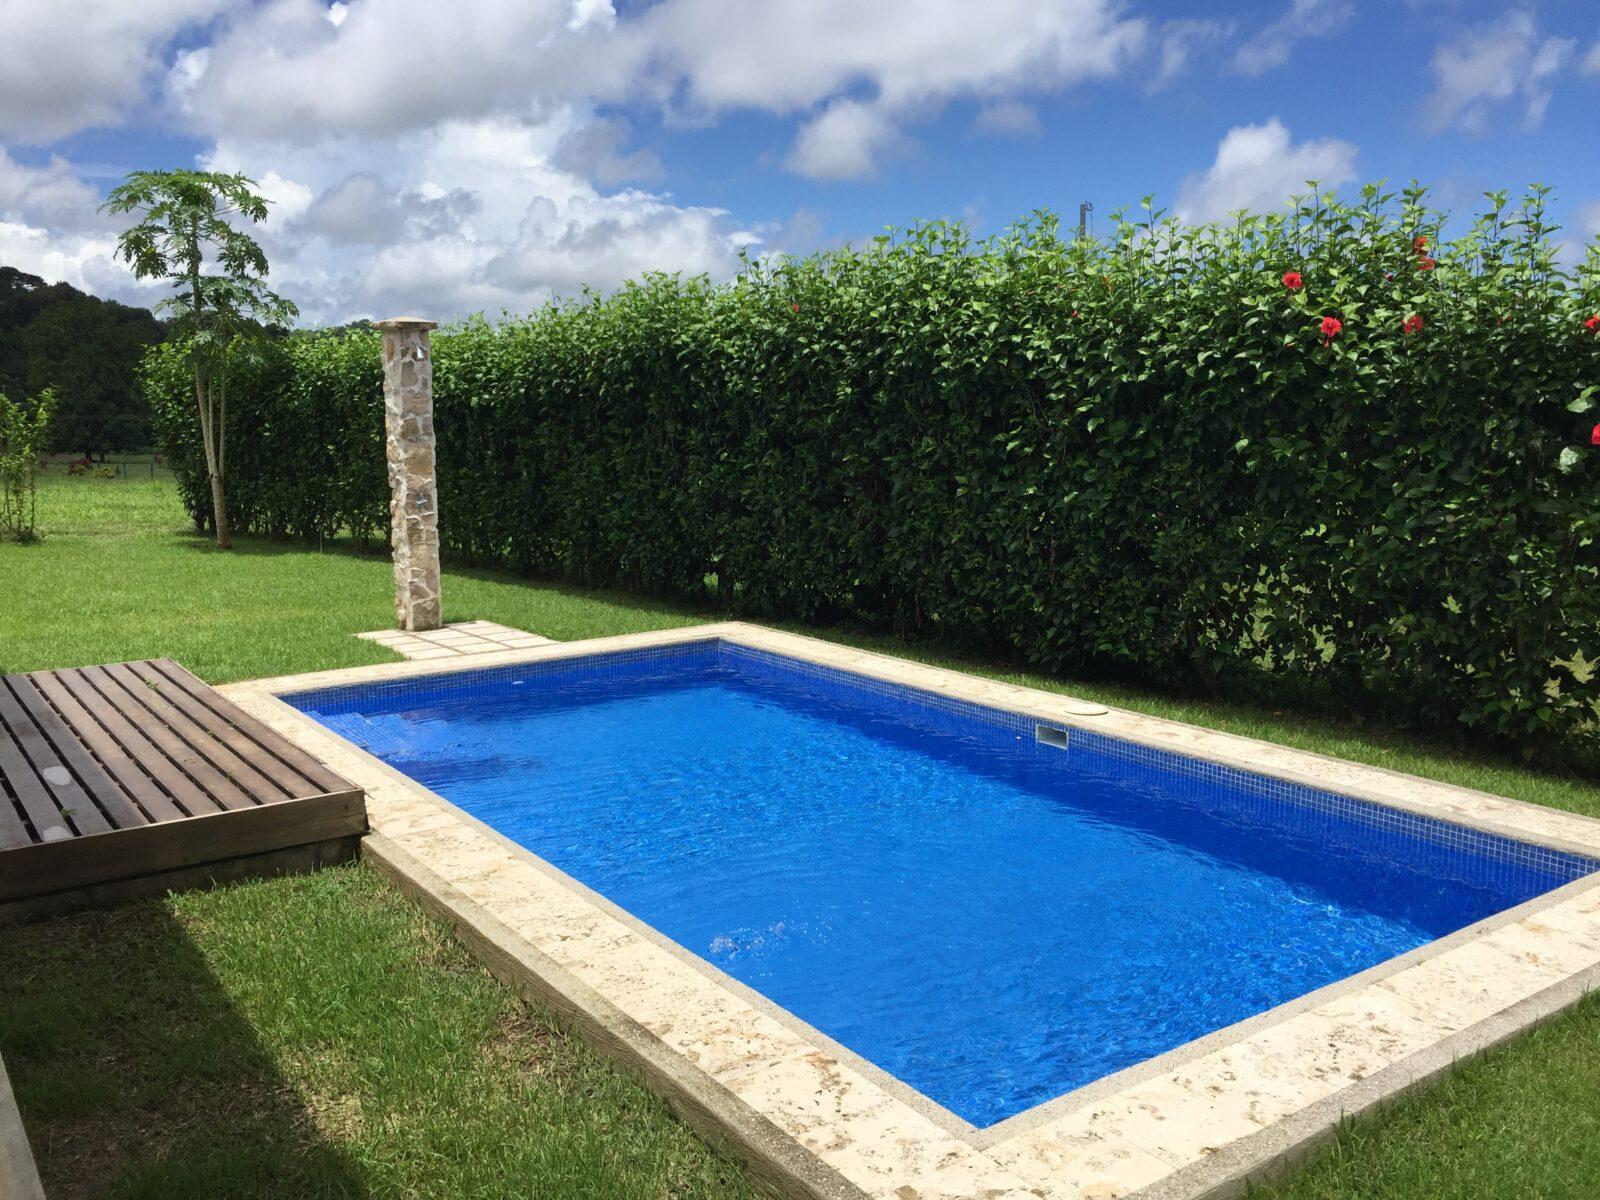 trogon pool villa rental costa rica